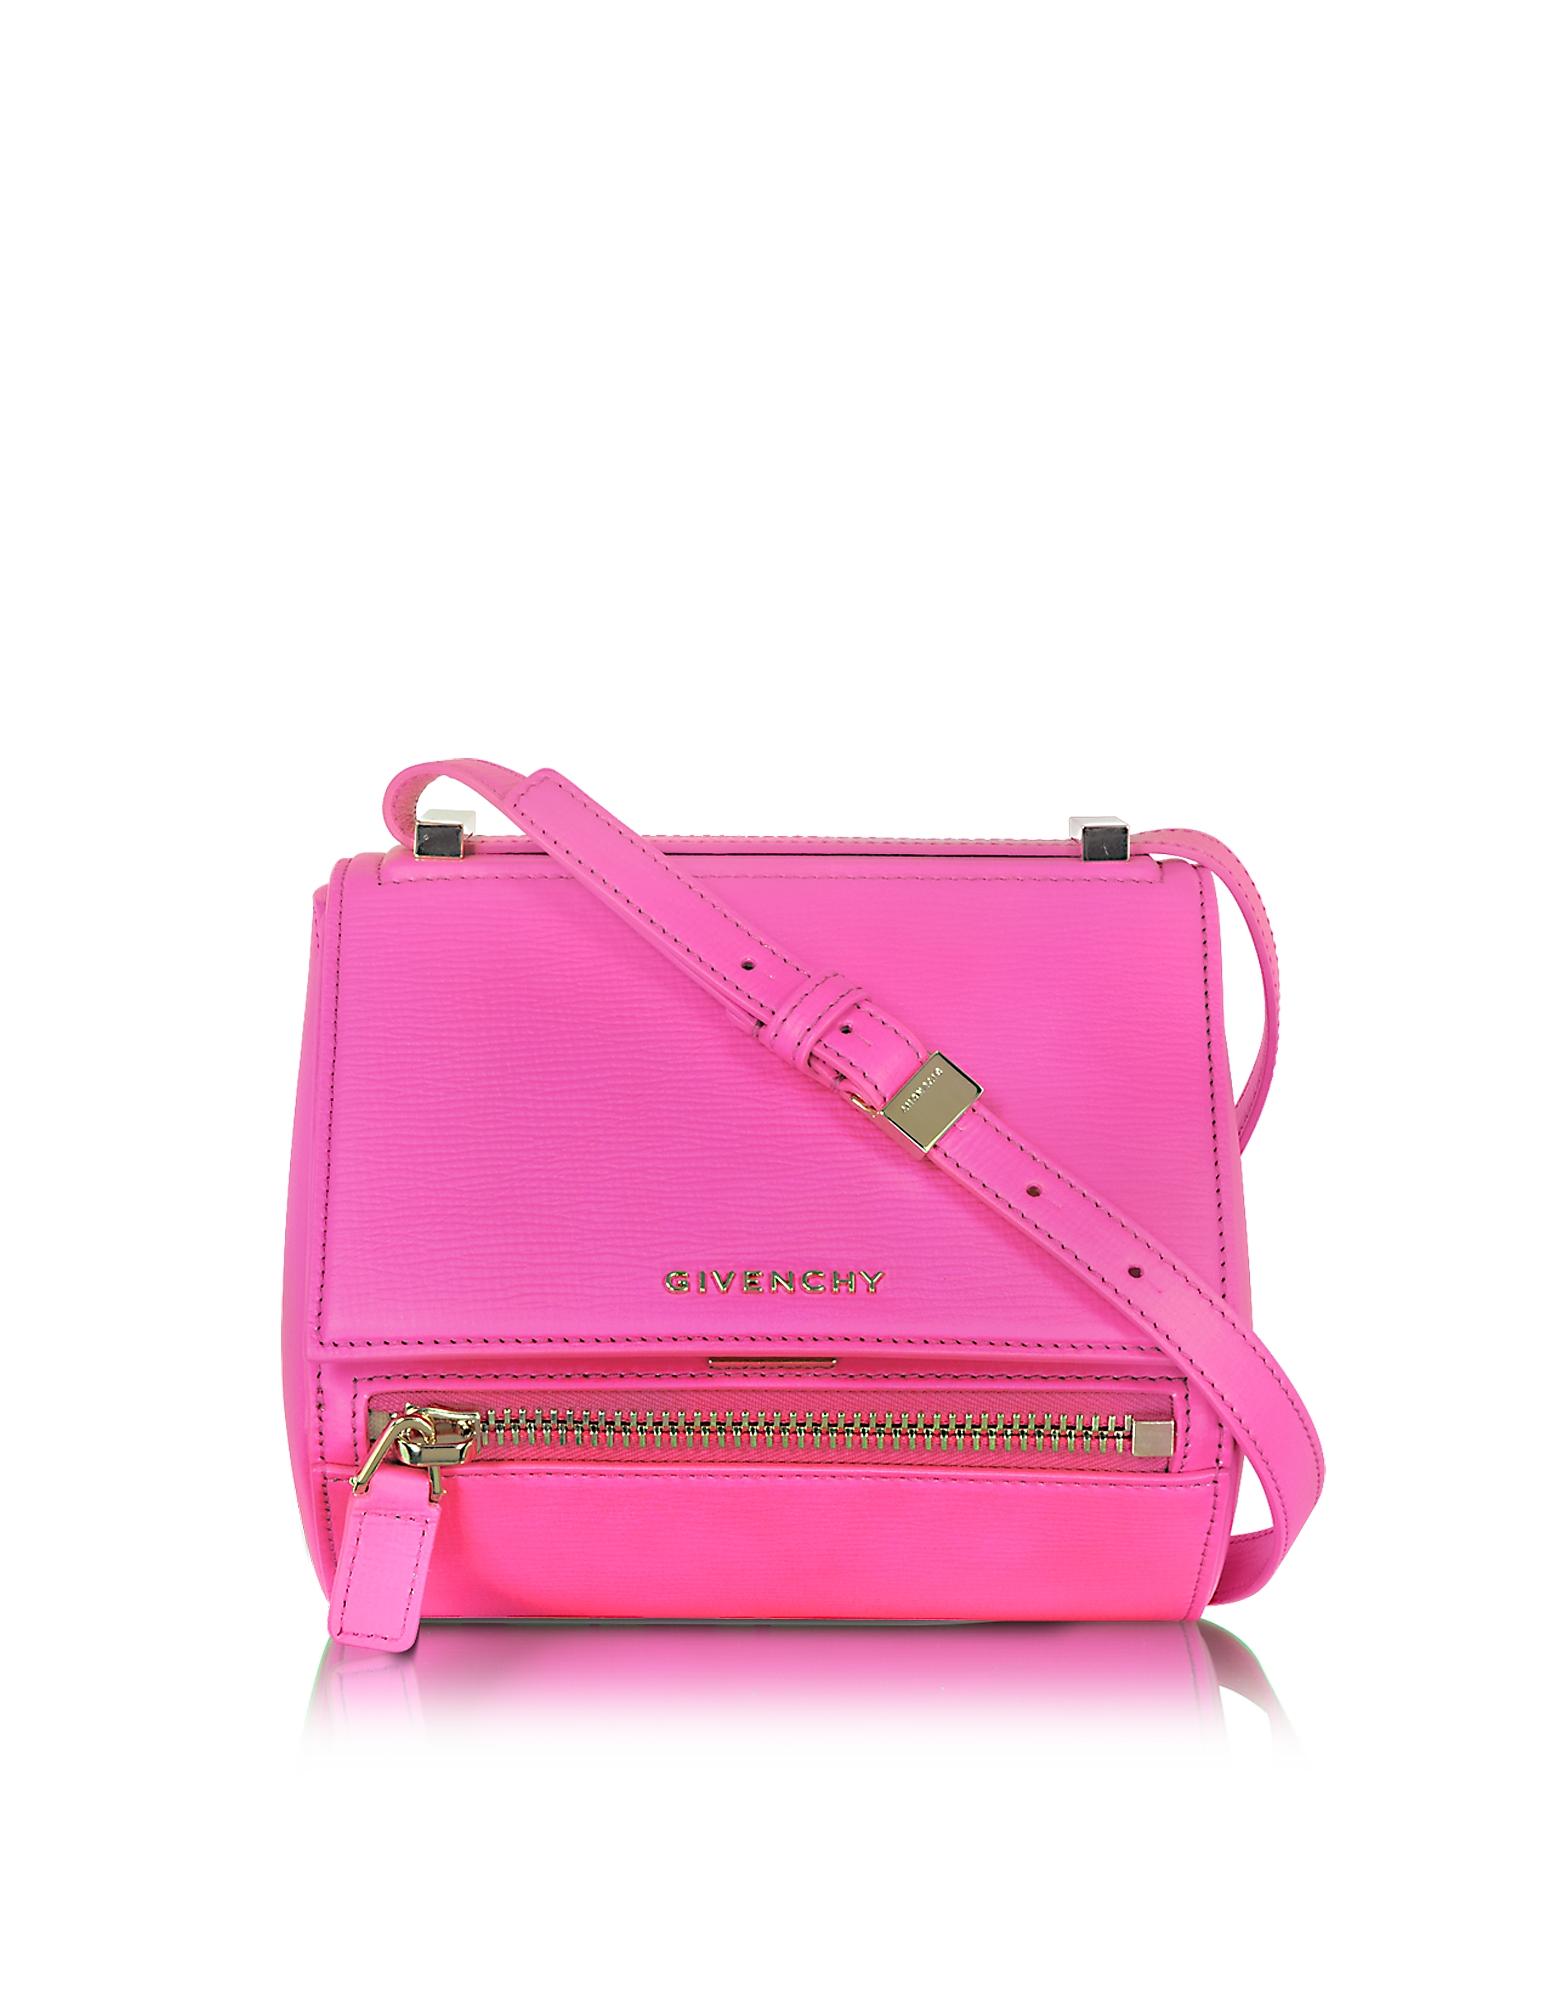 Givenchy Pandora - Маленькая Ярко-Розовая Кожаная Сумка Через Плечо